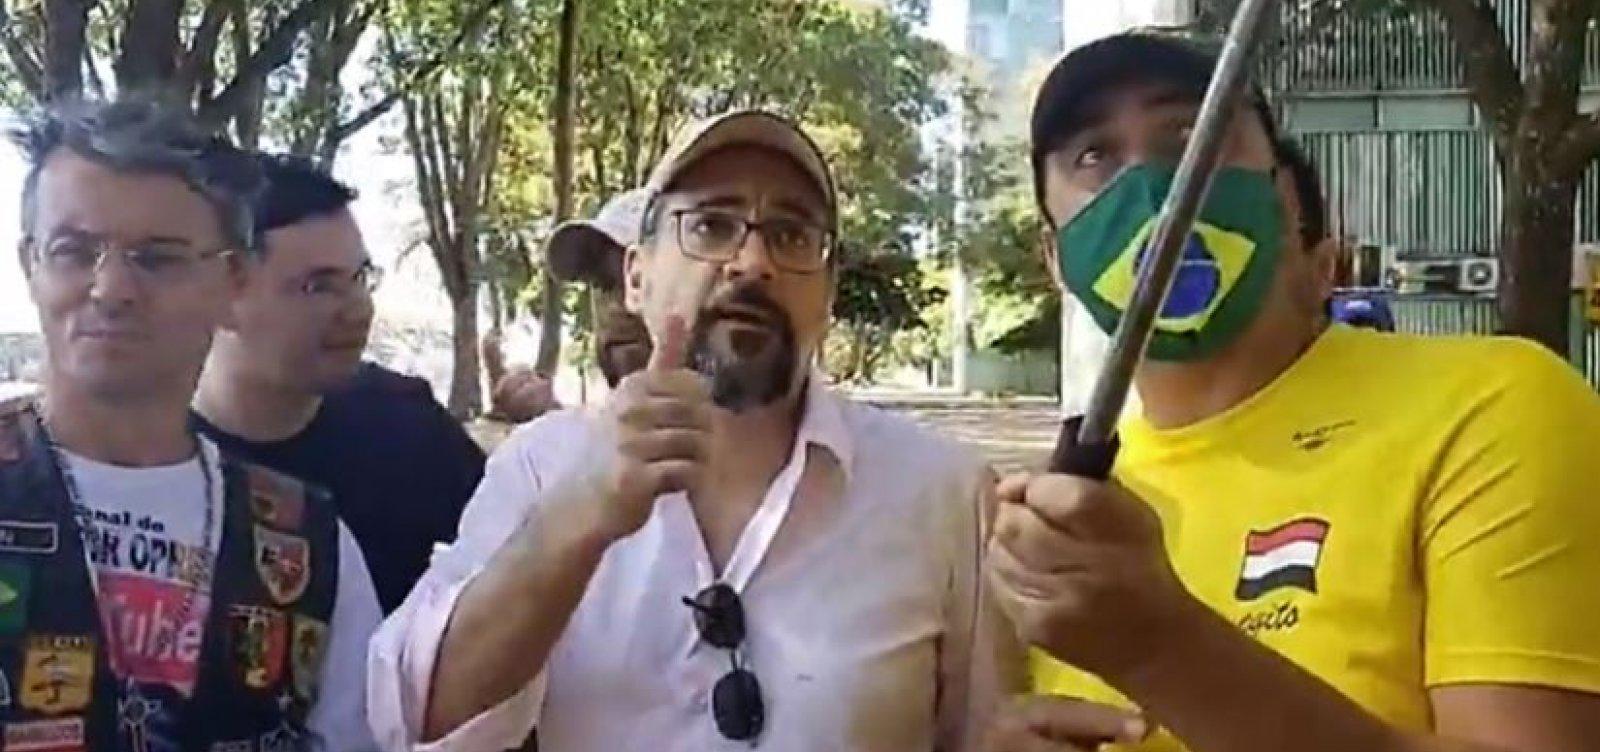 [Após ir a protesto sem máscara, Weintraub é multado em R$ 2 mil]